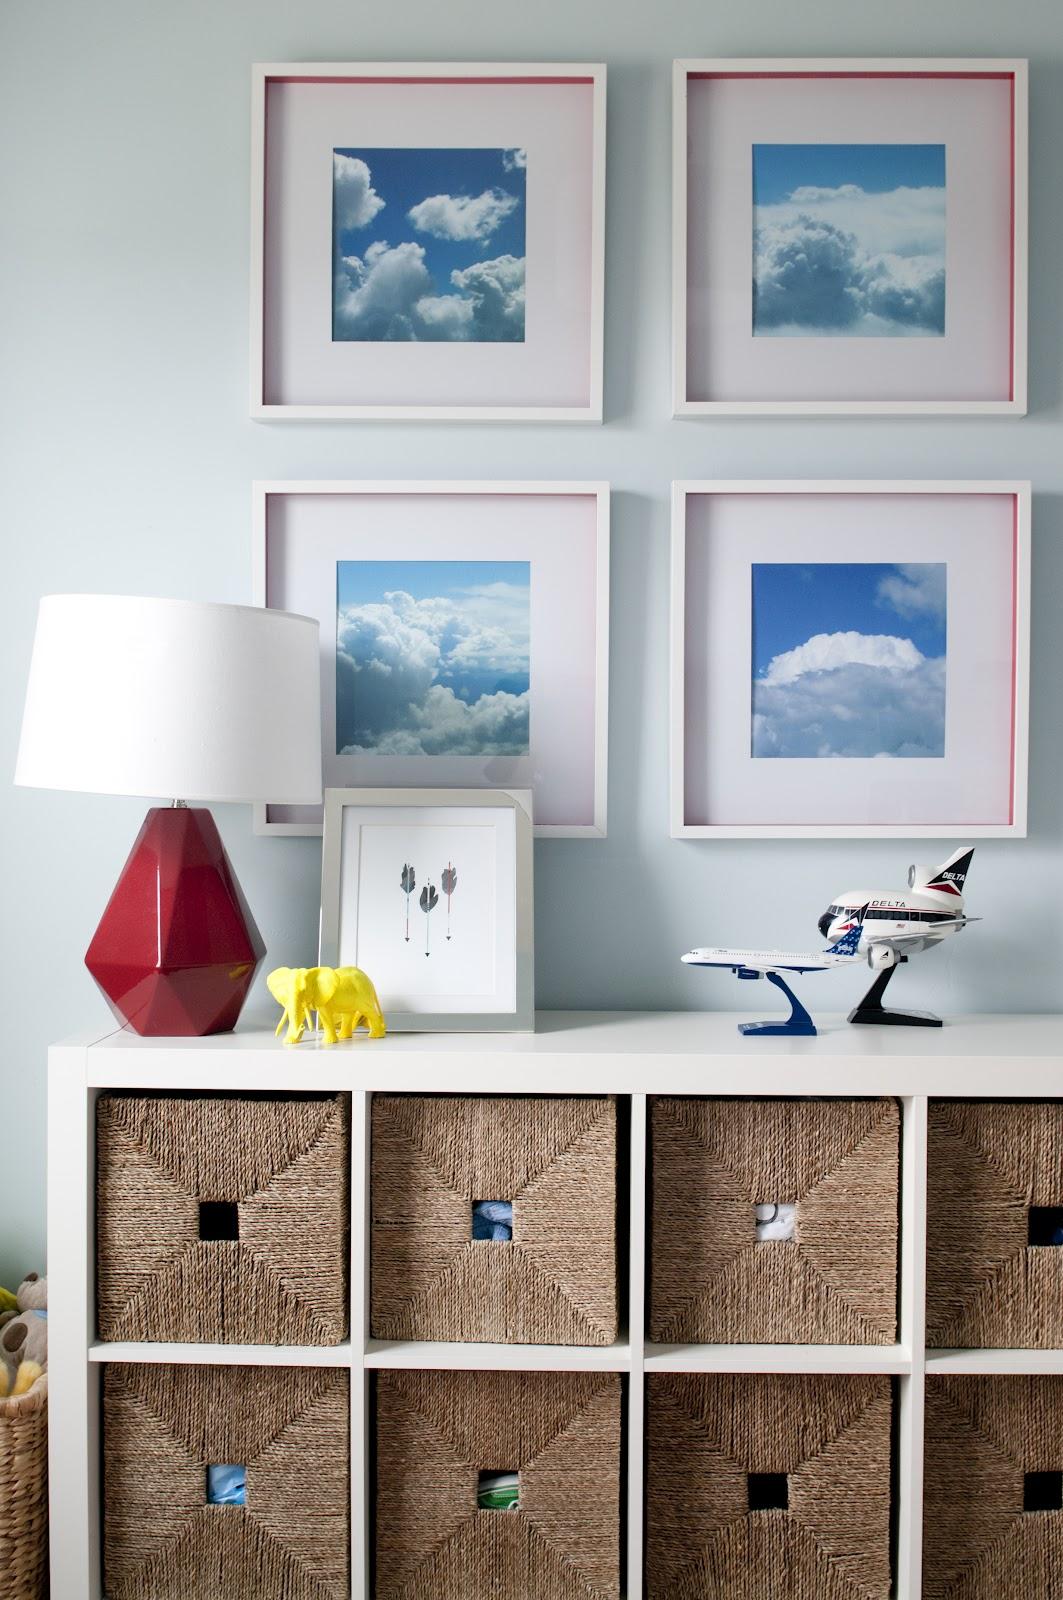 jett 39 s new room house of jade interiors blog. Black Bedroom Furniture Sets. Home Design Ideas